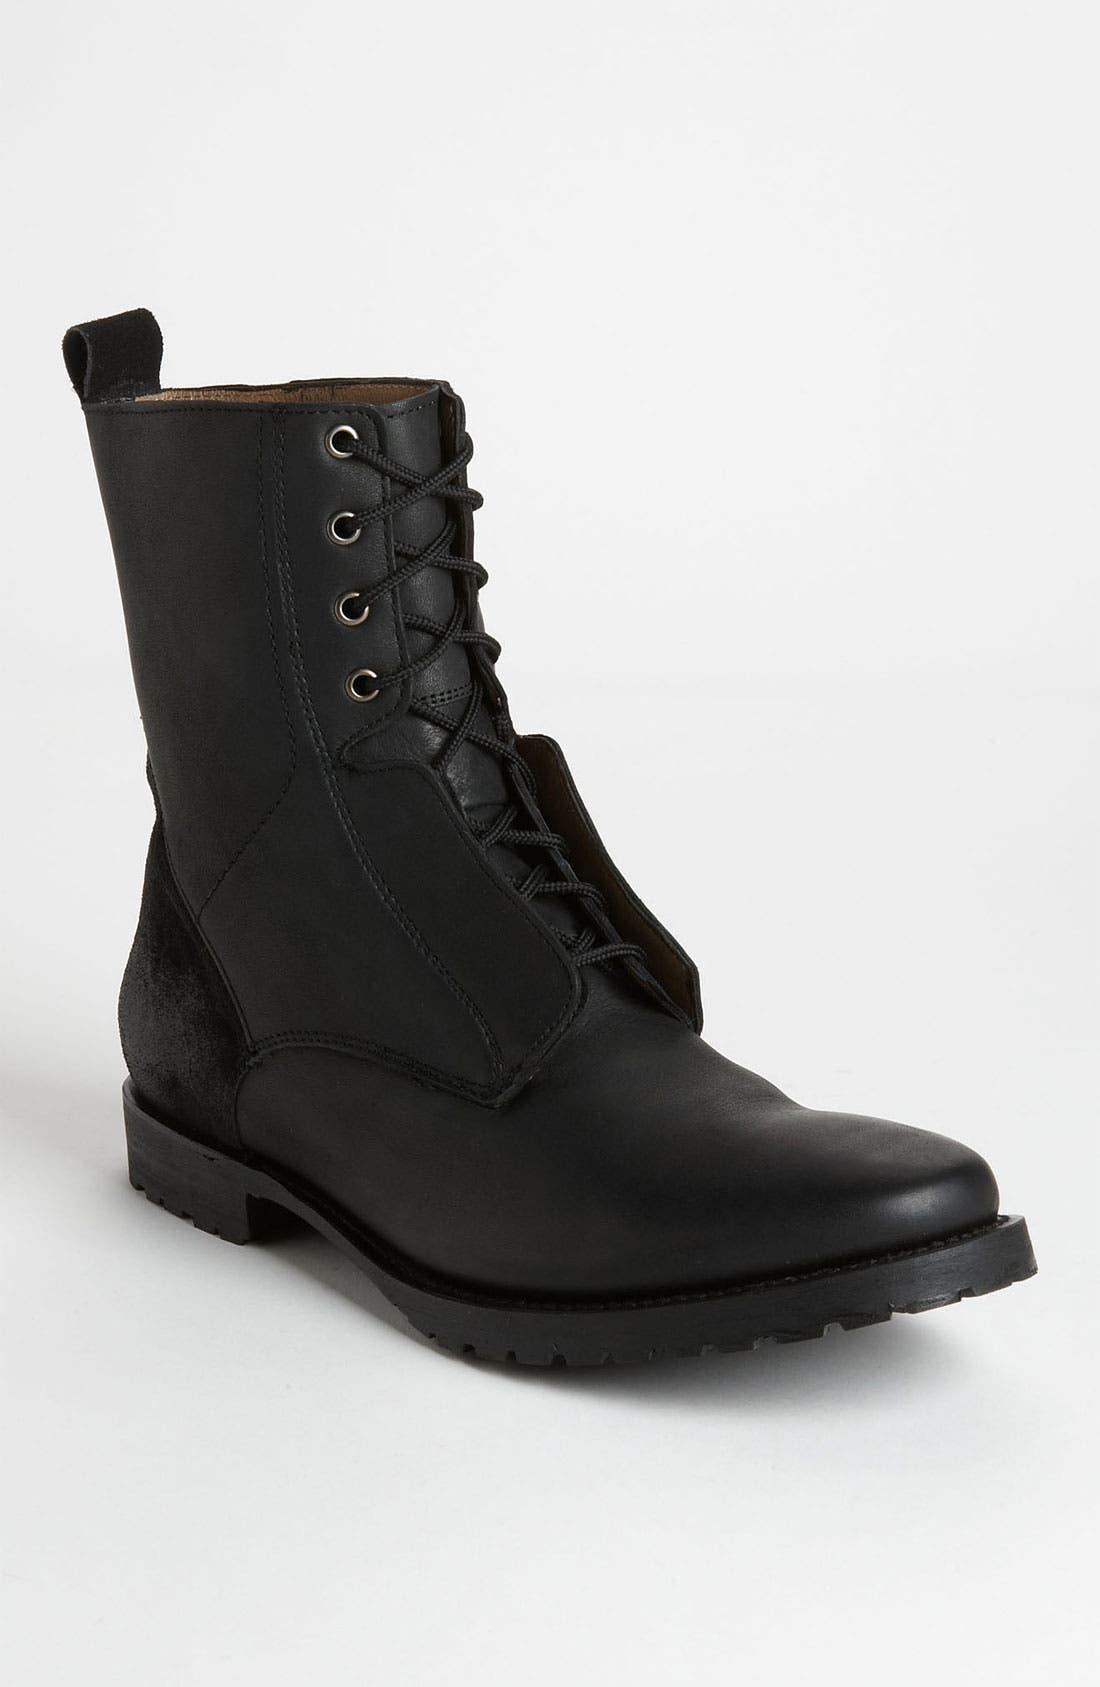 Main Image - J.D. Fisk 'Locke' Plain Toe Boot